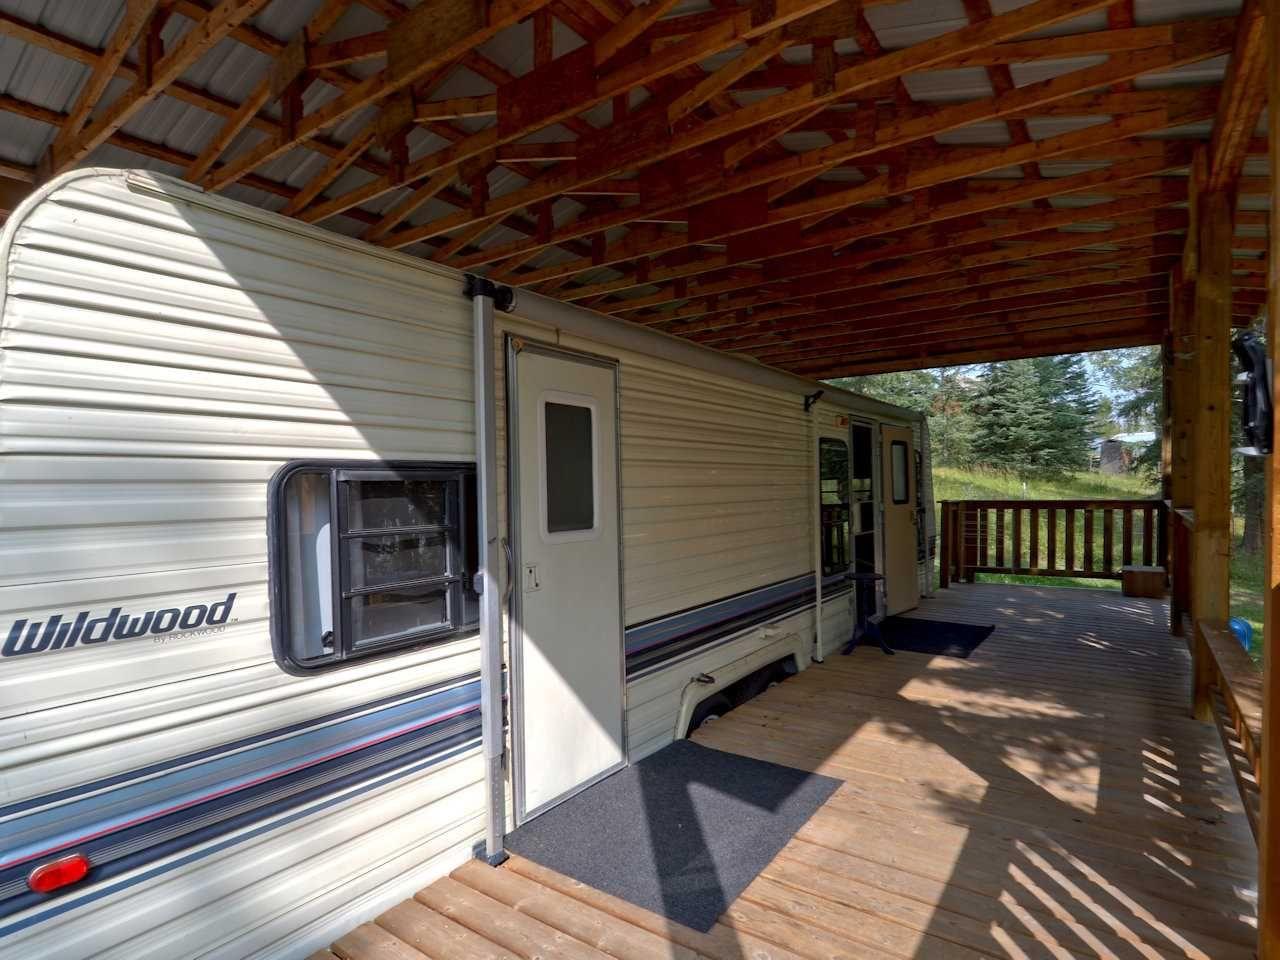 Photo 18: Photos: 7271 NATH Road in Bridge Lake: Bridge Lake/Sheridan Lake Land for sale (100 Mile House (Zone 10))  : MLS®# R2496086